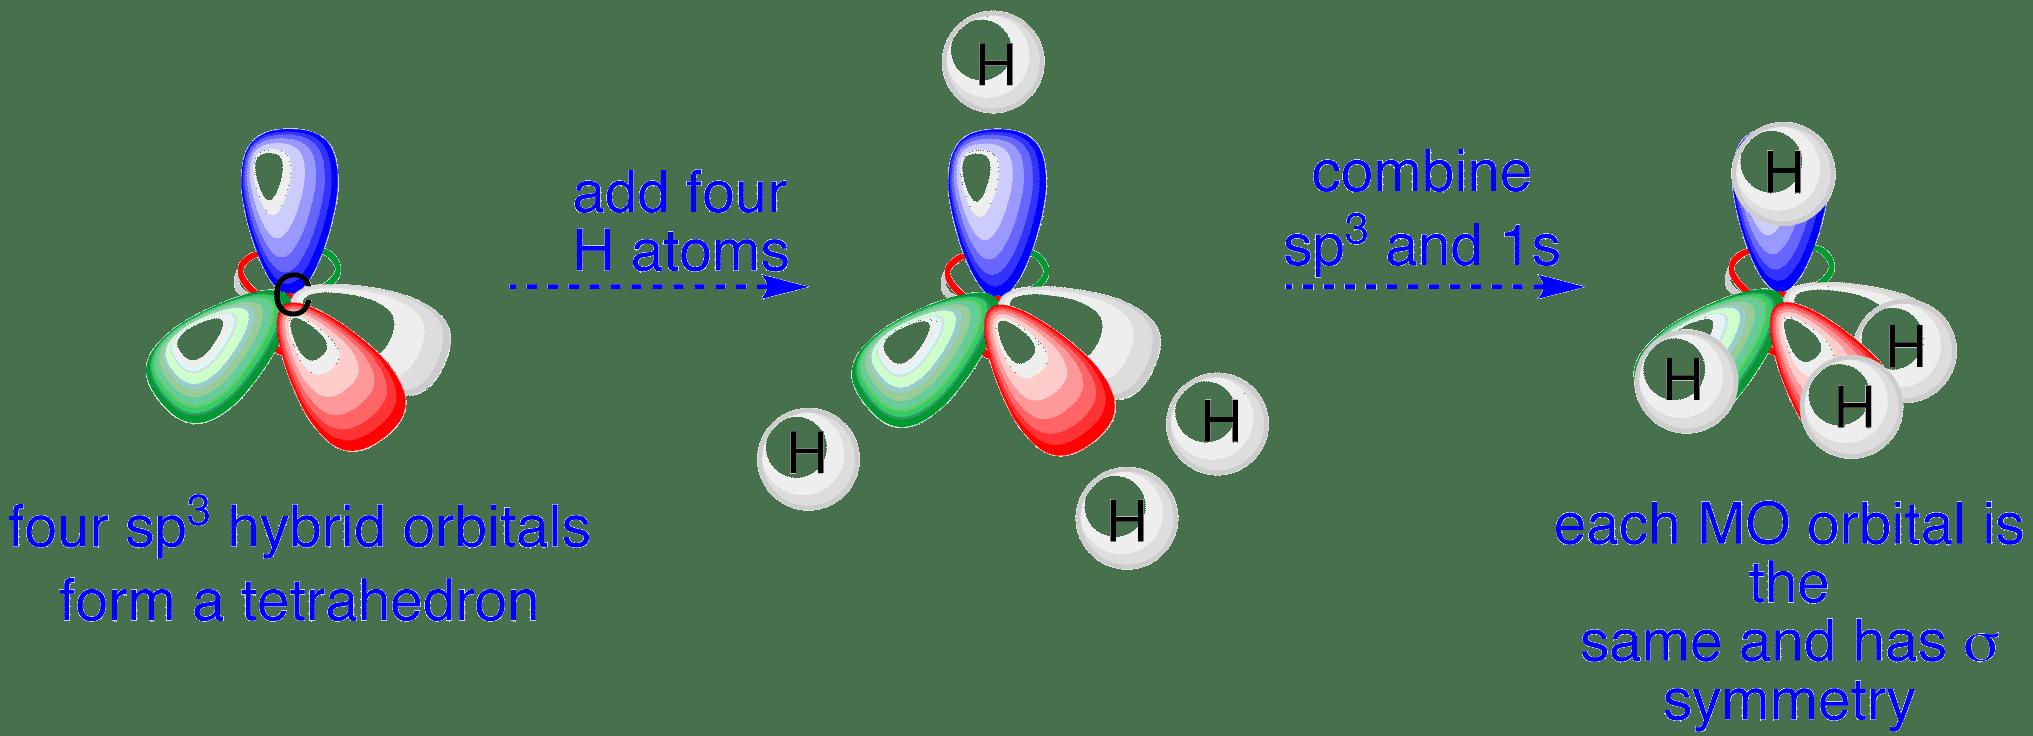 Methane orbitals